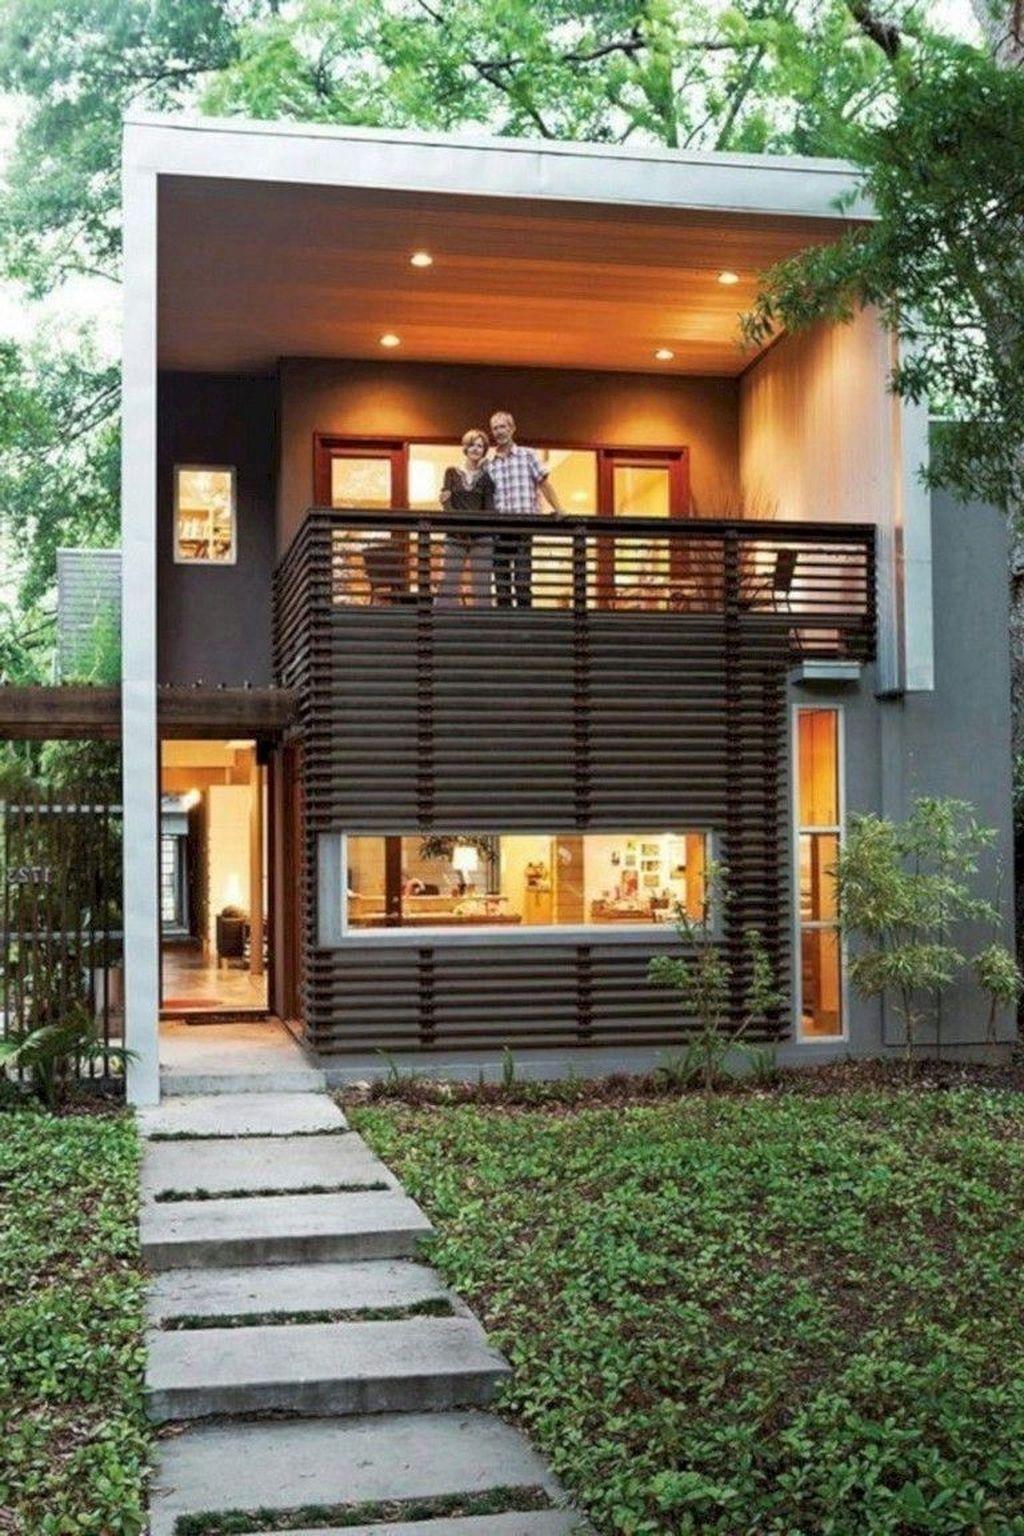 Awesome Small Contemporary House Designs Ideas To Try 22 Di 2020 Arsitektur Rumah Arsitektur Modern Arsitektur